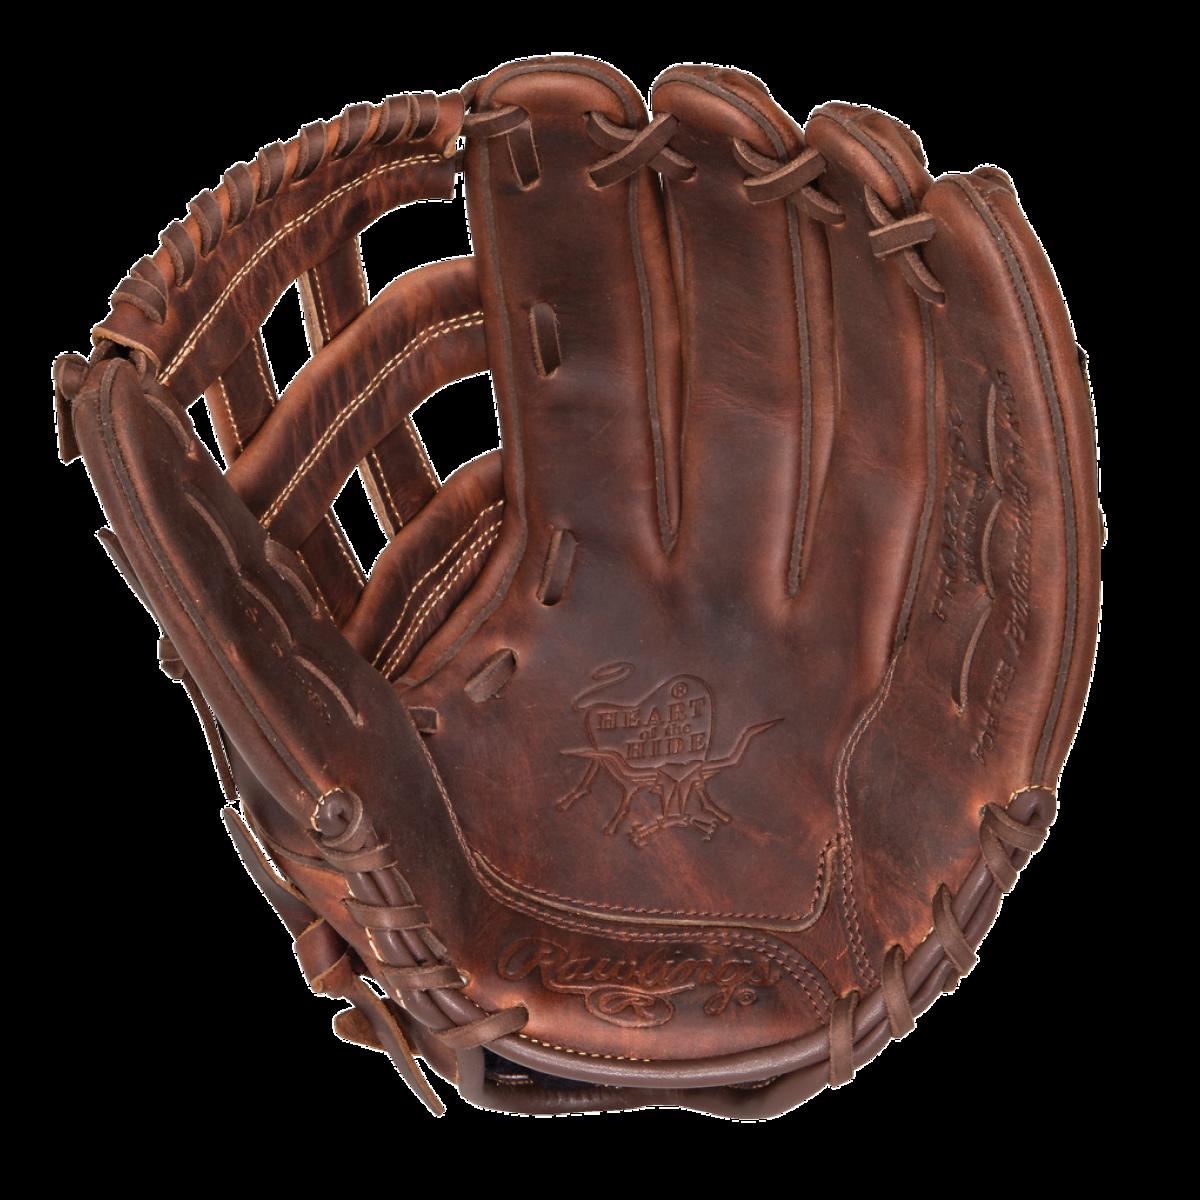 Gloves clipart softball, Gloves softball Transparent FREE ...